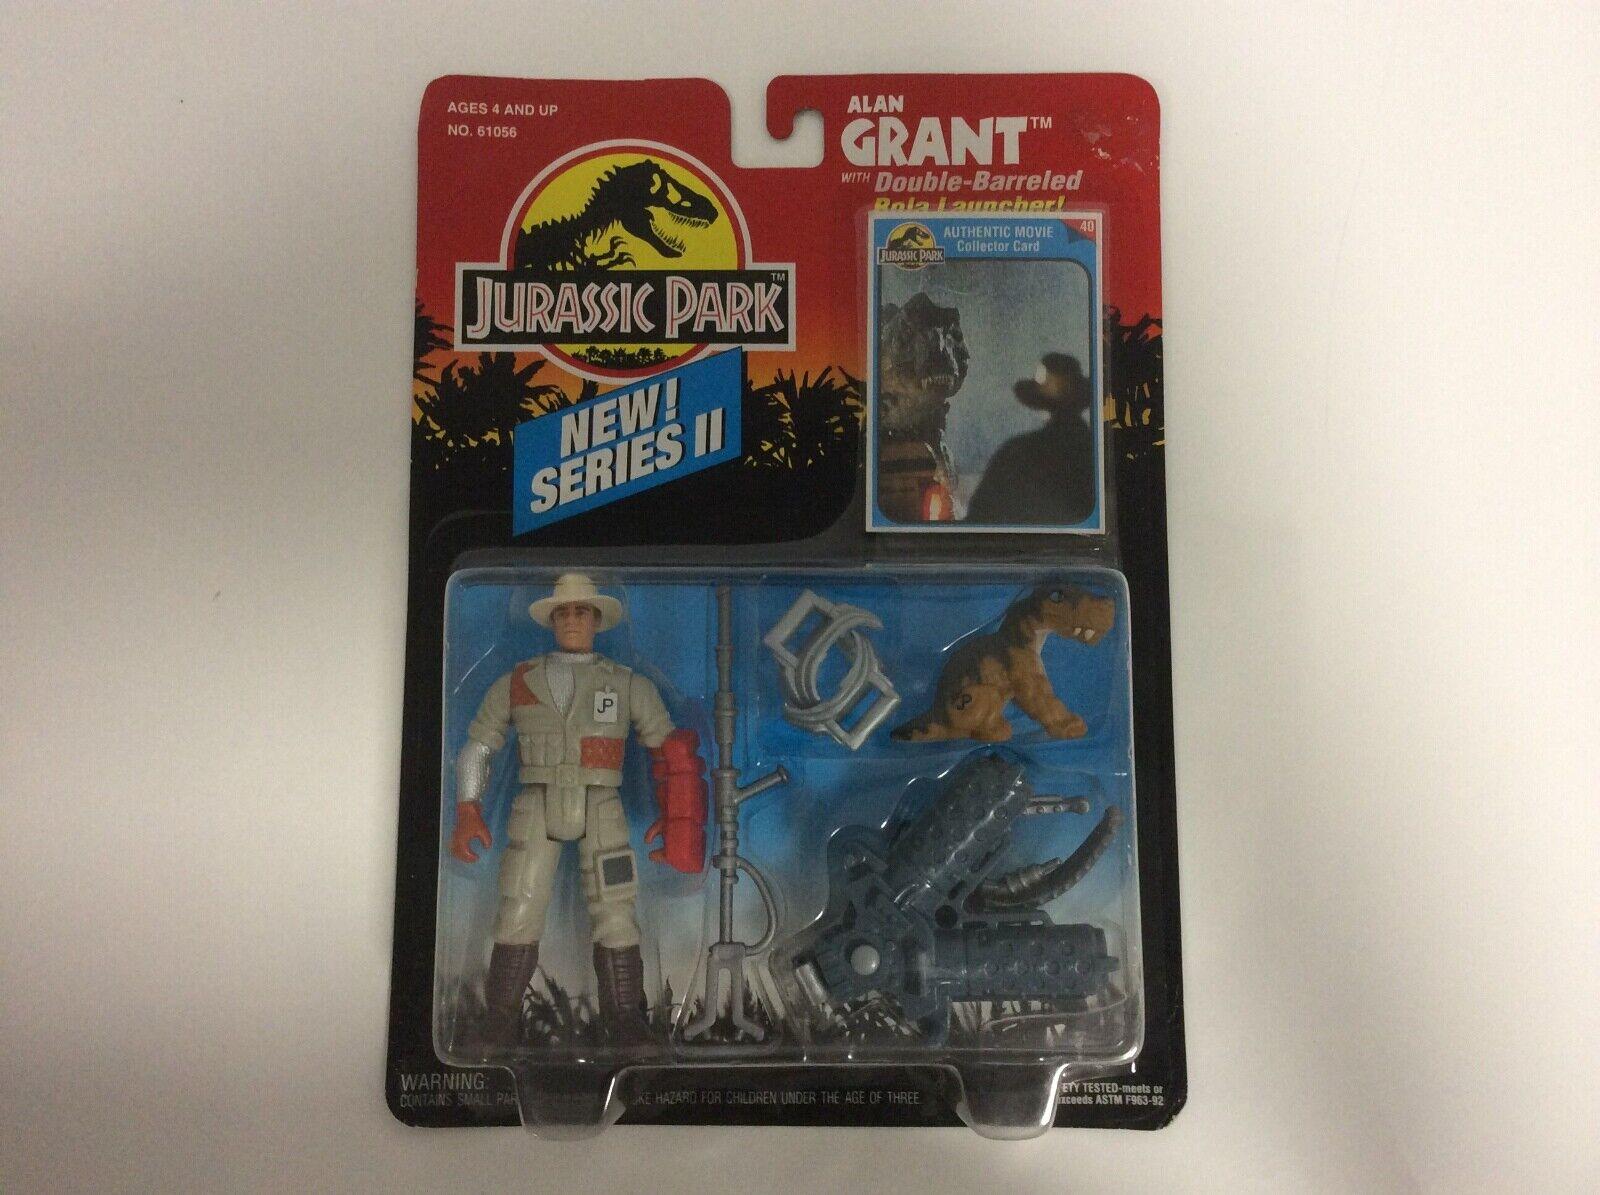 1993 Jurassic Park New  Series II Action Figure - Alan Grant  - MOSC